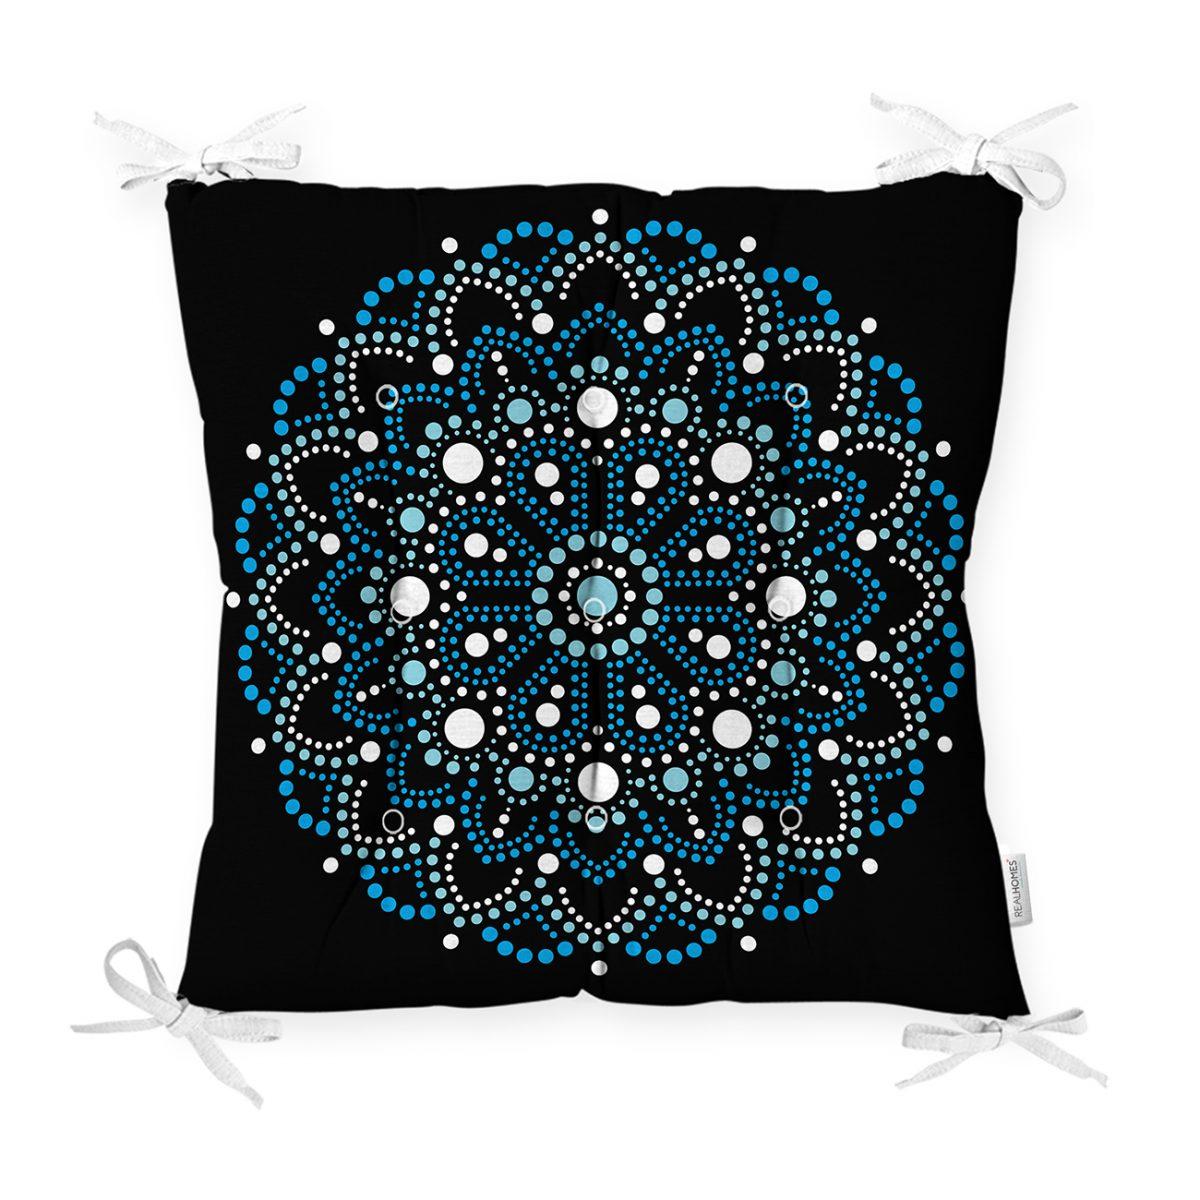 Siyah Zeminde Mavi Boncuklu Mandala Dekoratif Pofidik Sandalye Minderi Realhomes